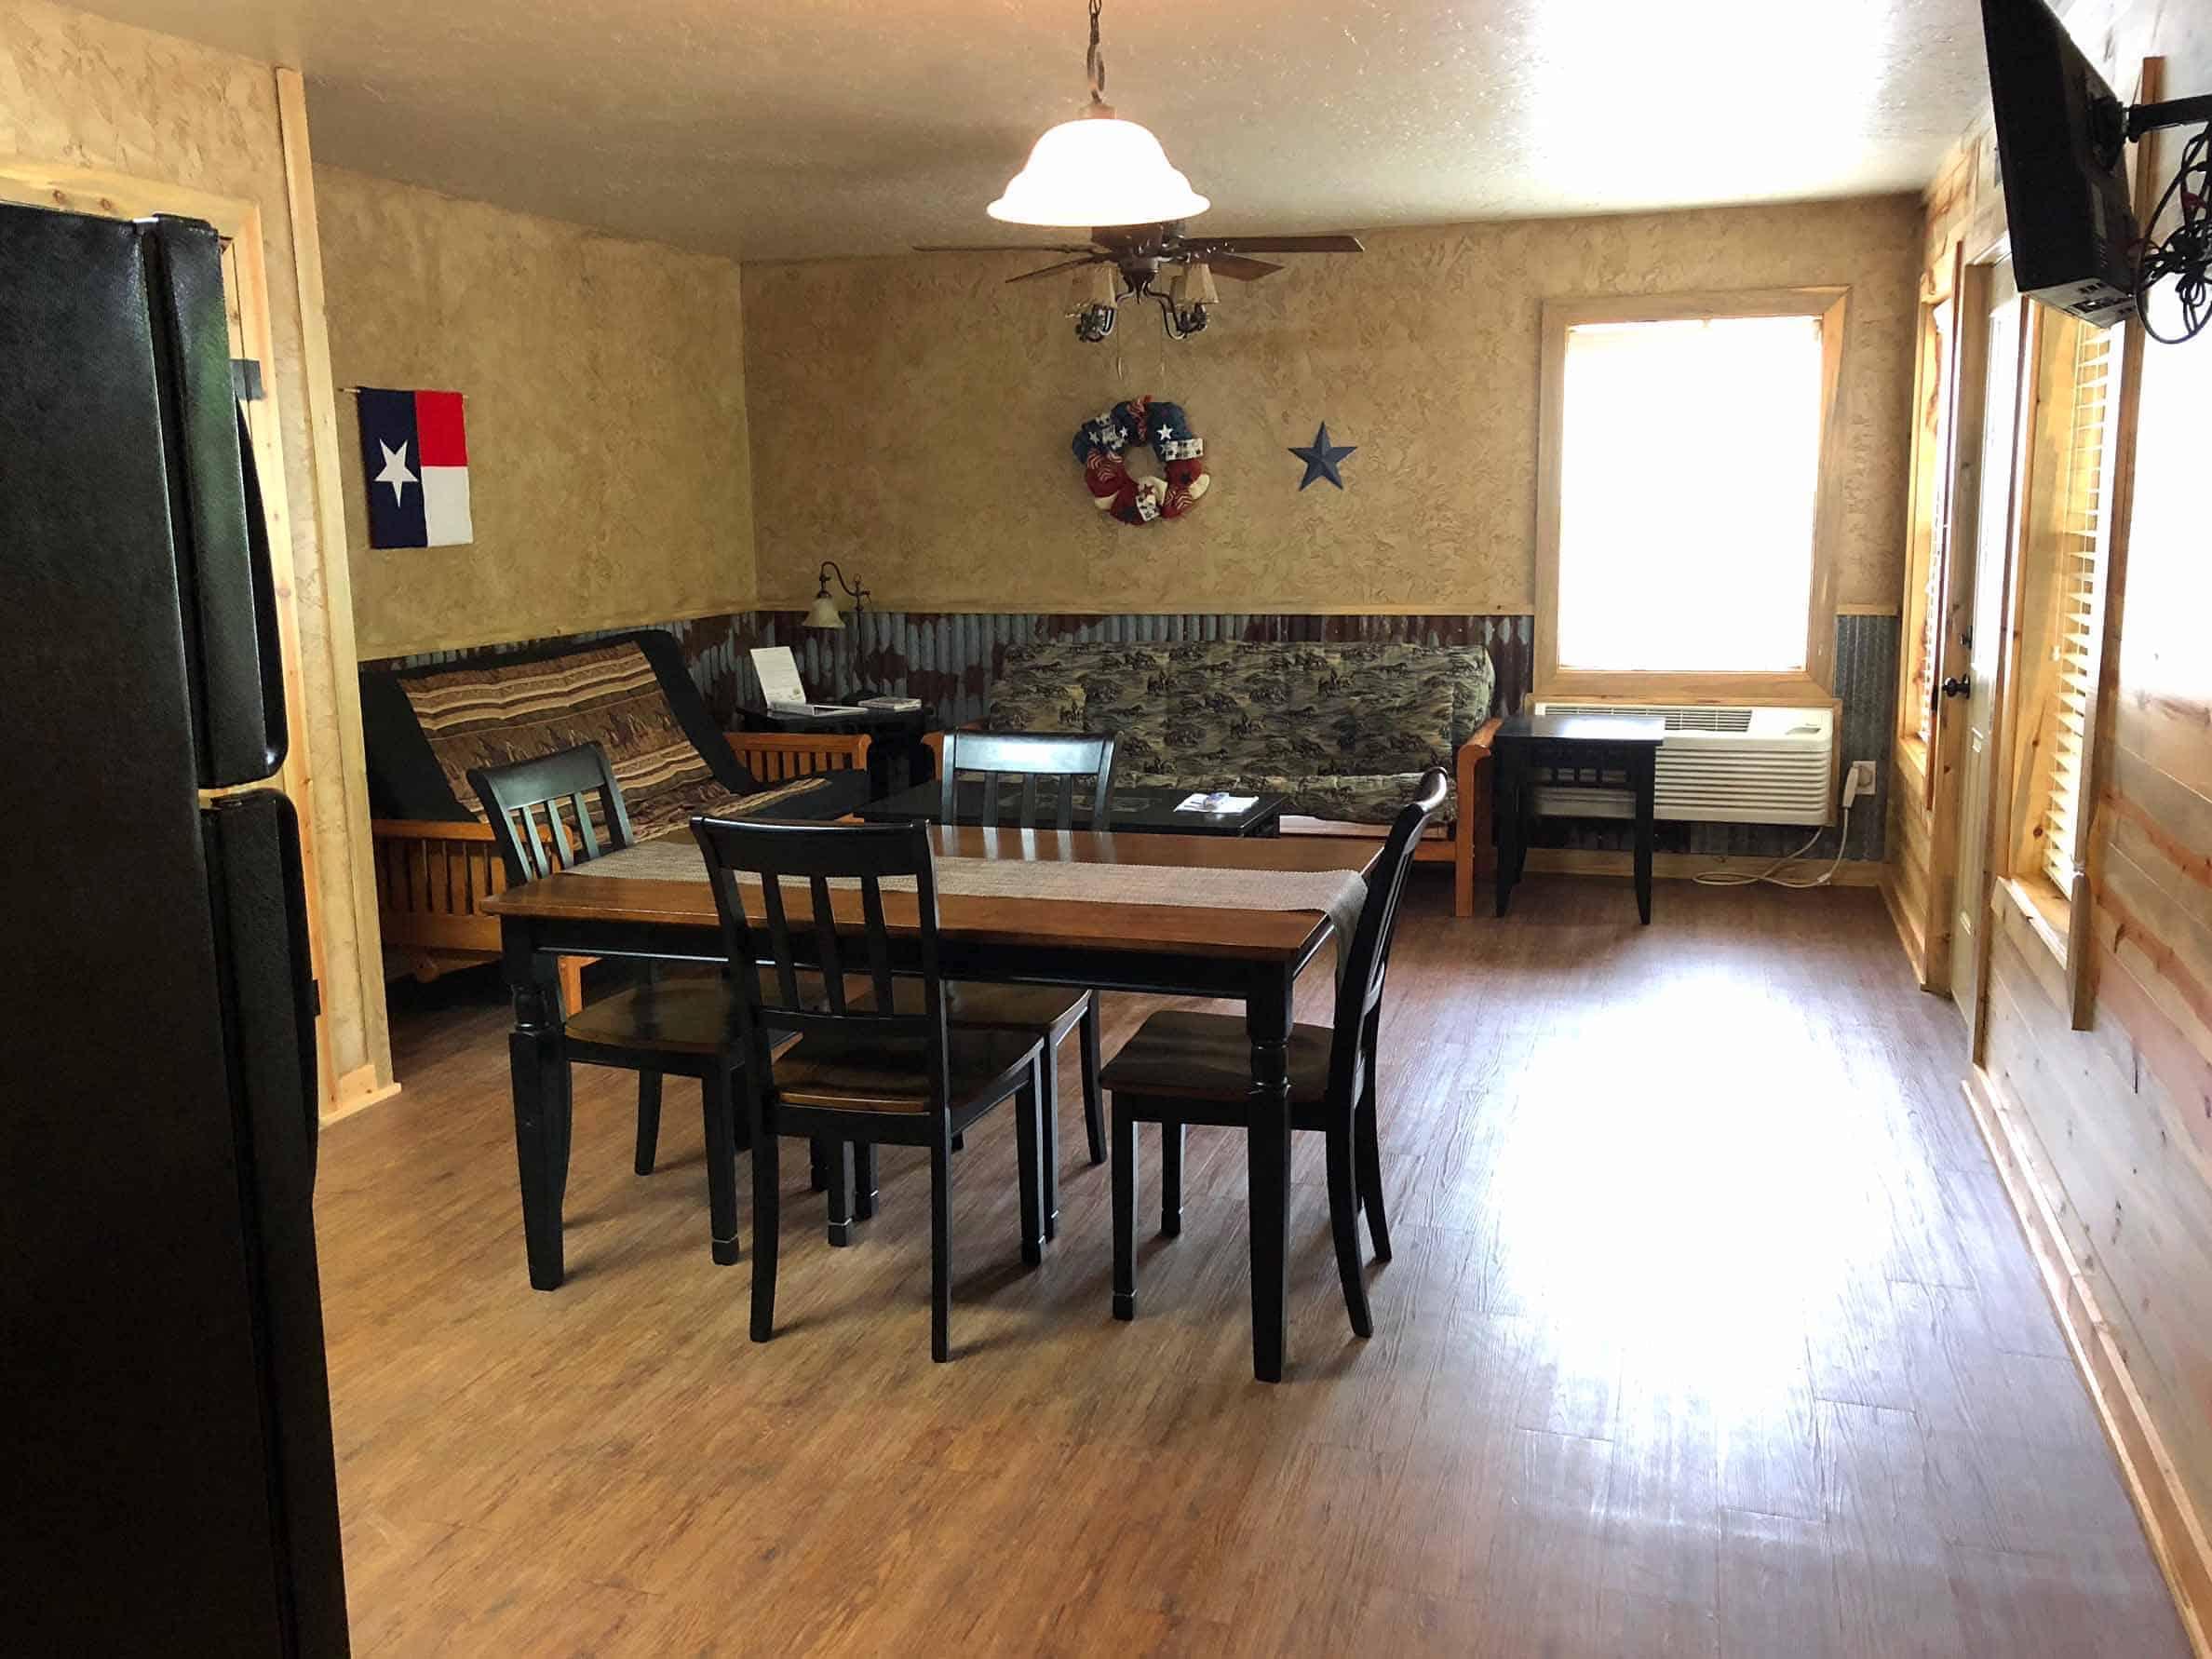 BackWater-Jacks-Cabin-Duplex-rentals-living